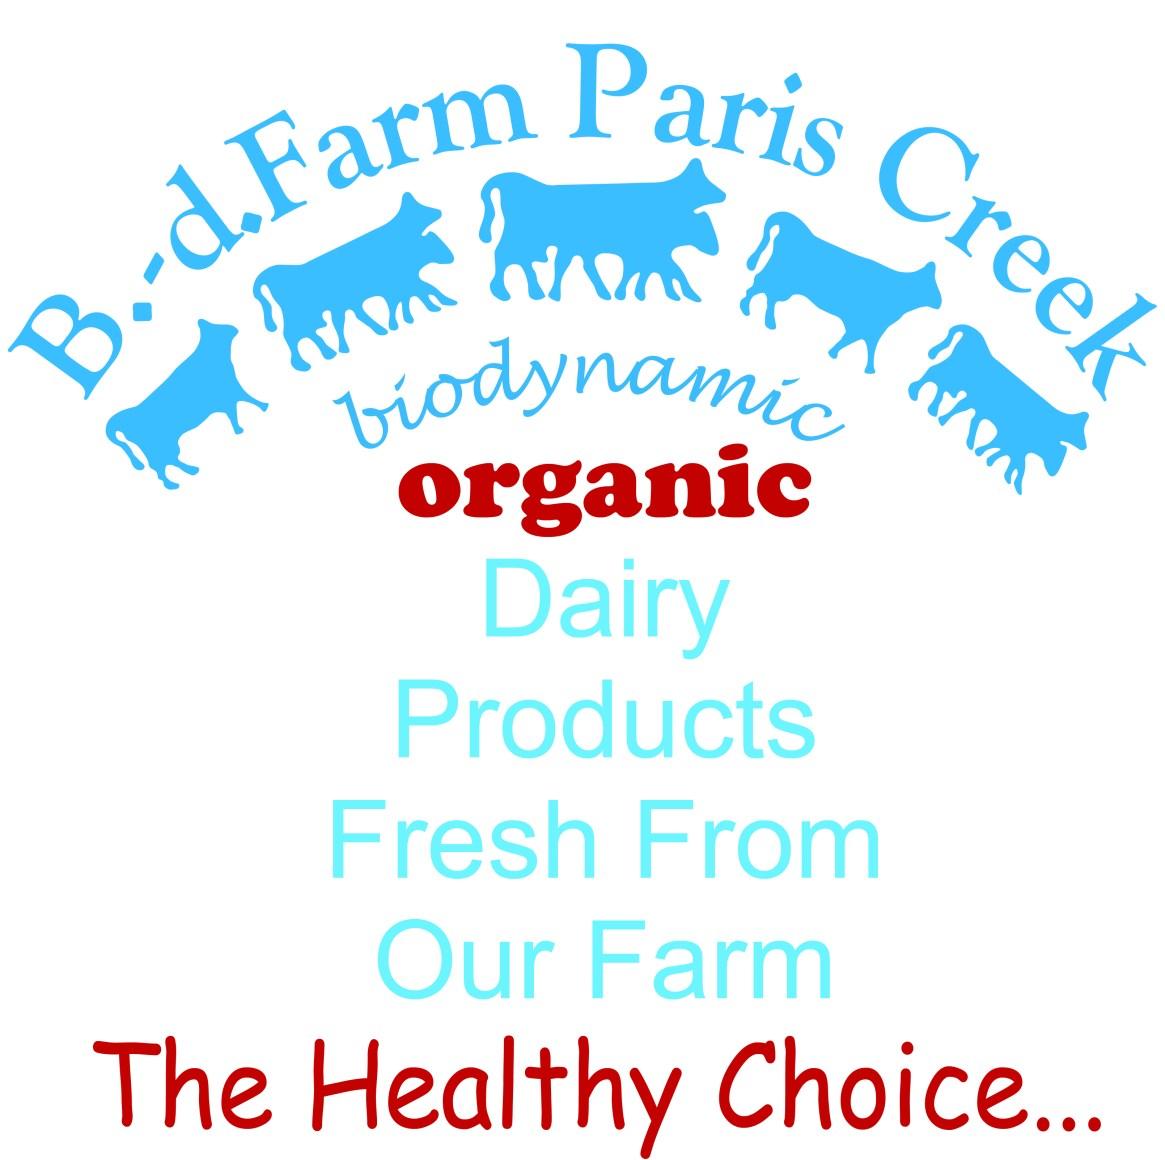 Full Logo B. d. Farm Paris Creek High Resolution 300dpi